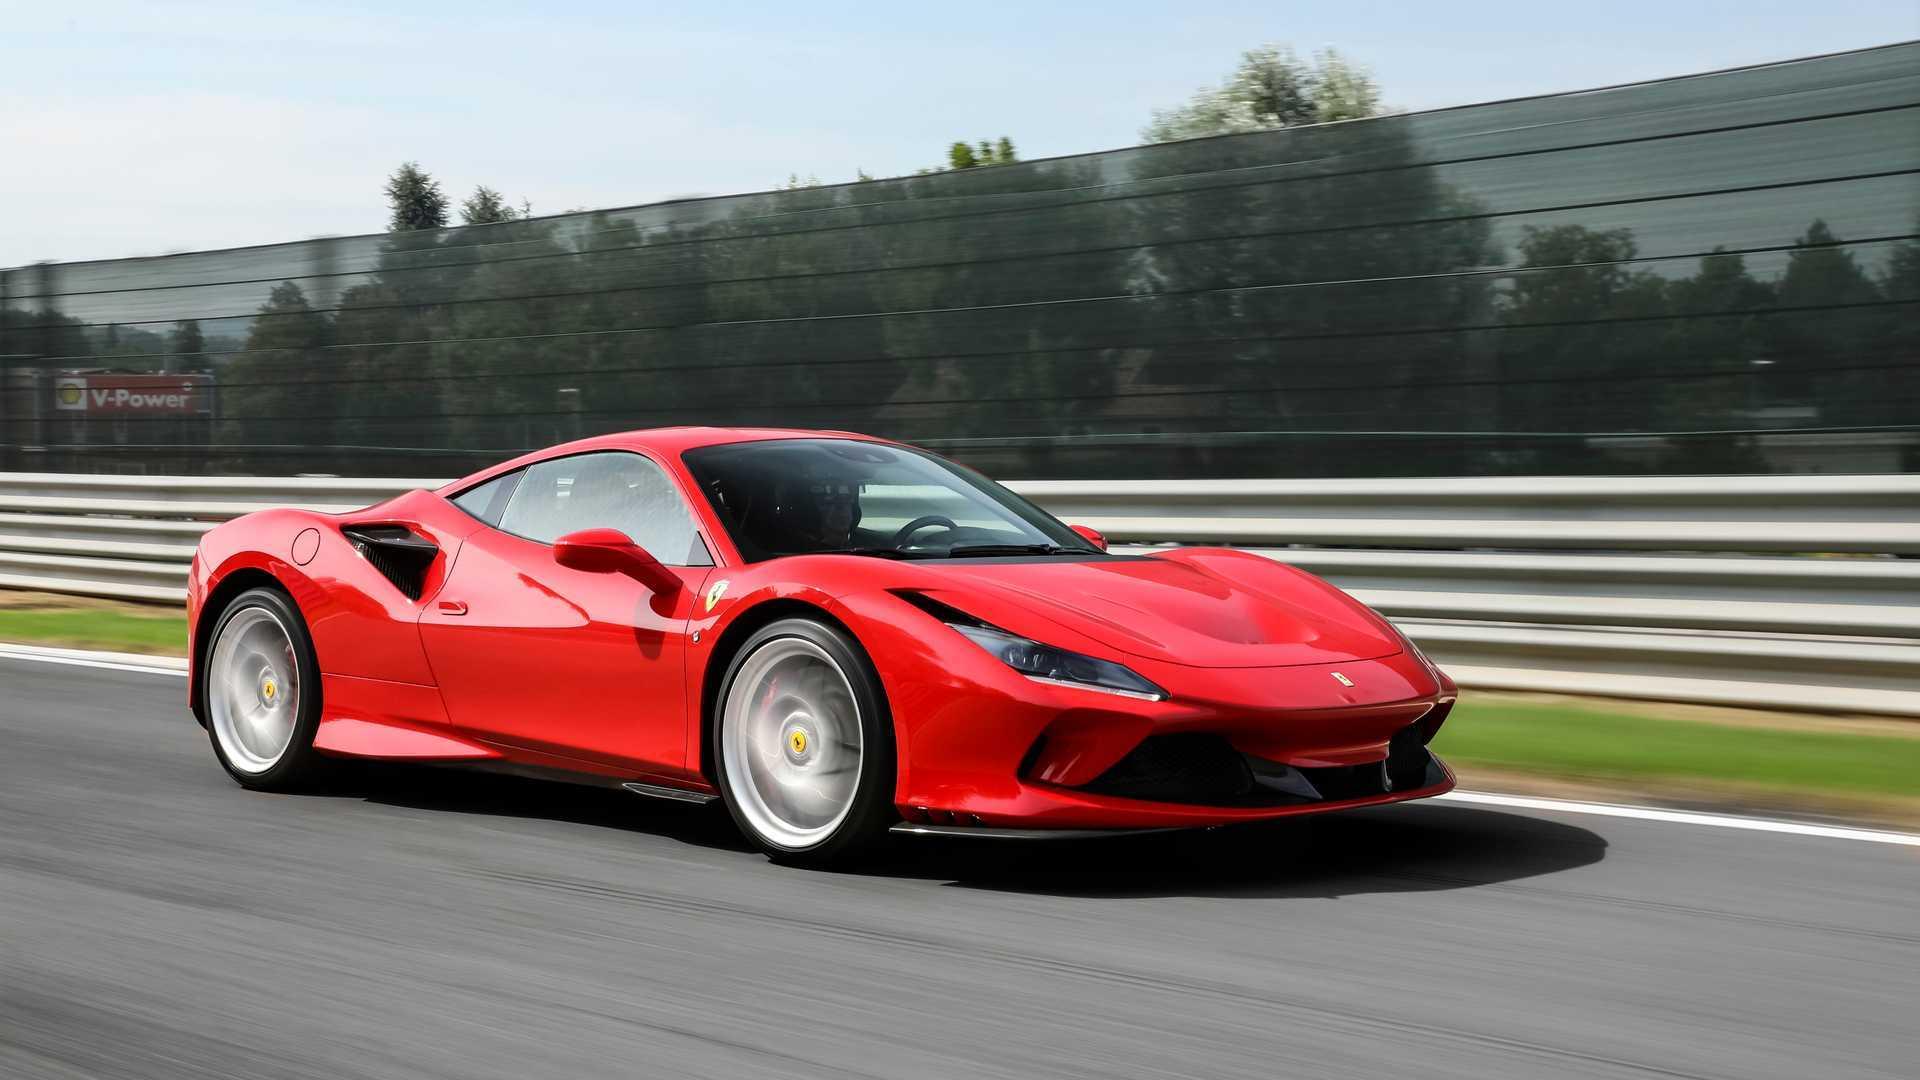 Report: Ferrari Model Lifecycles Will Keep Getting Shorter